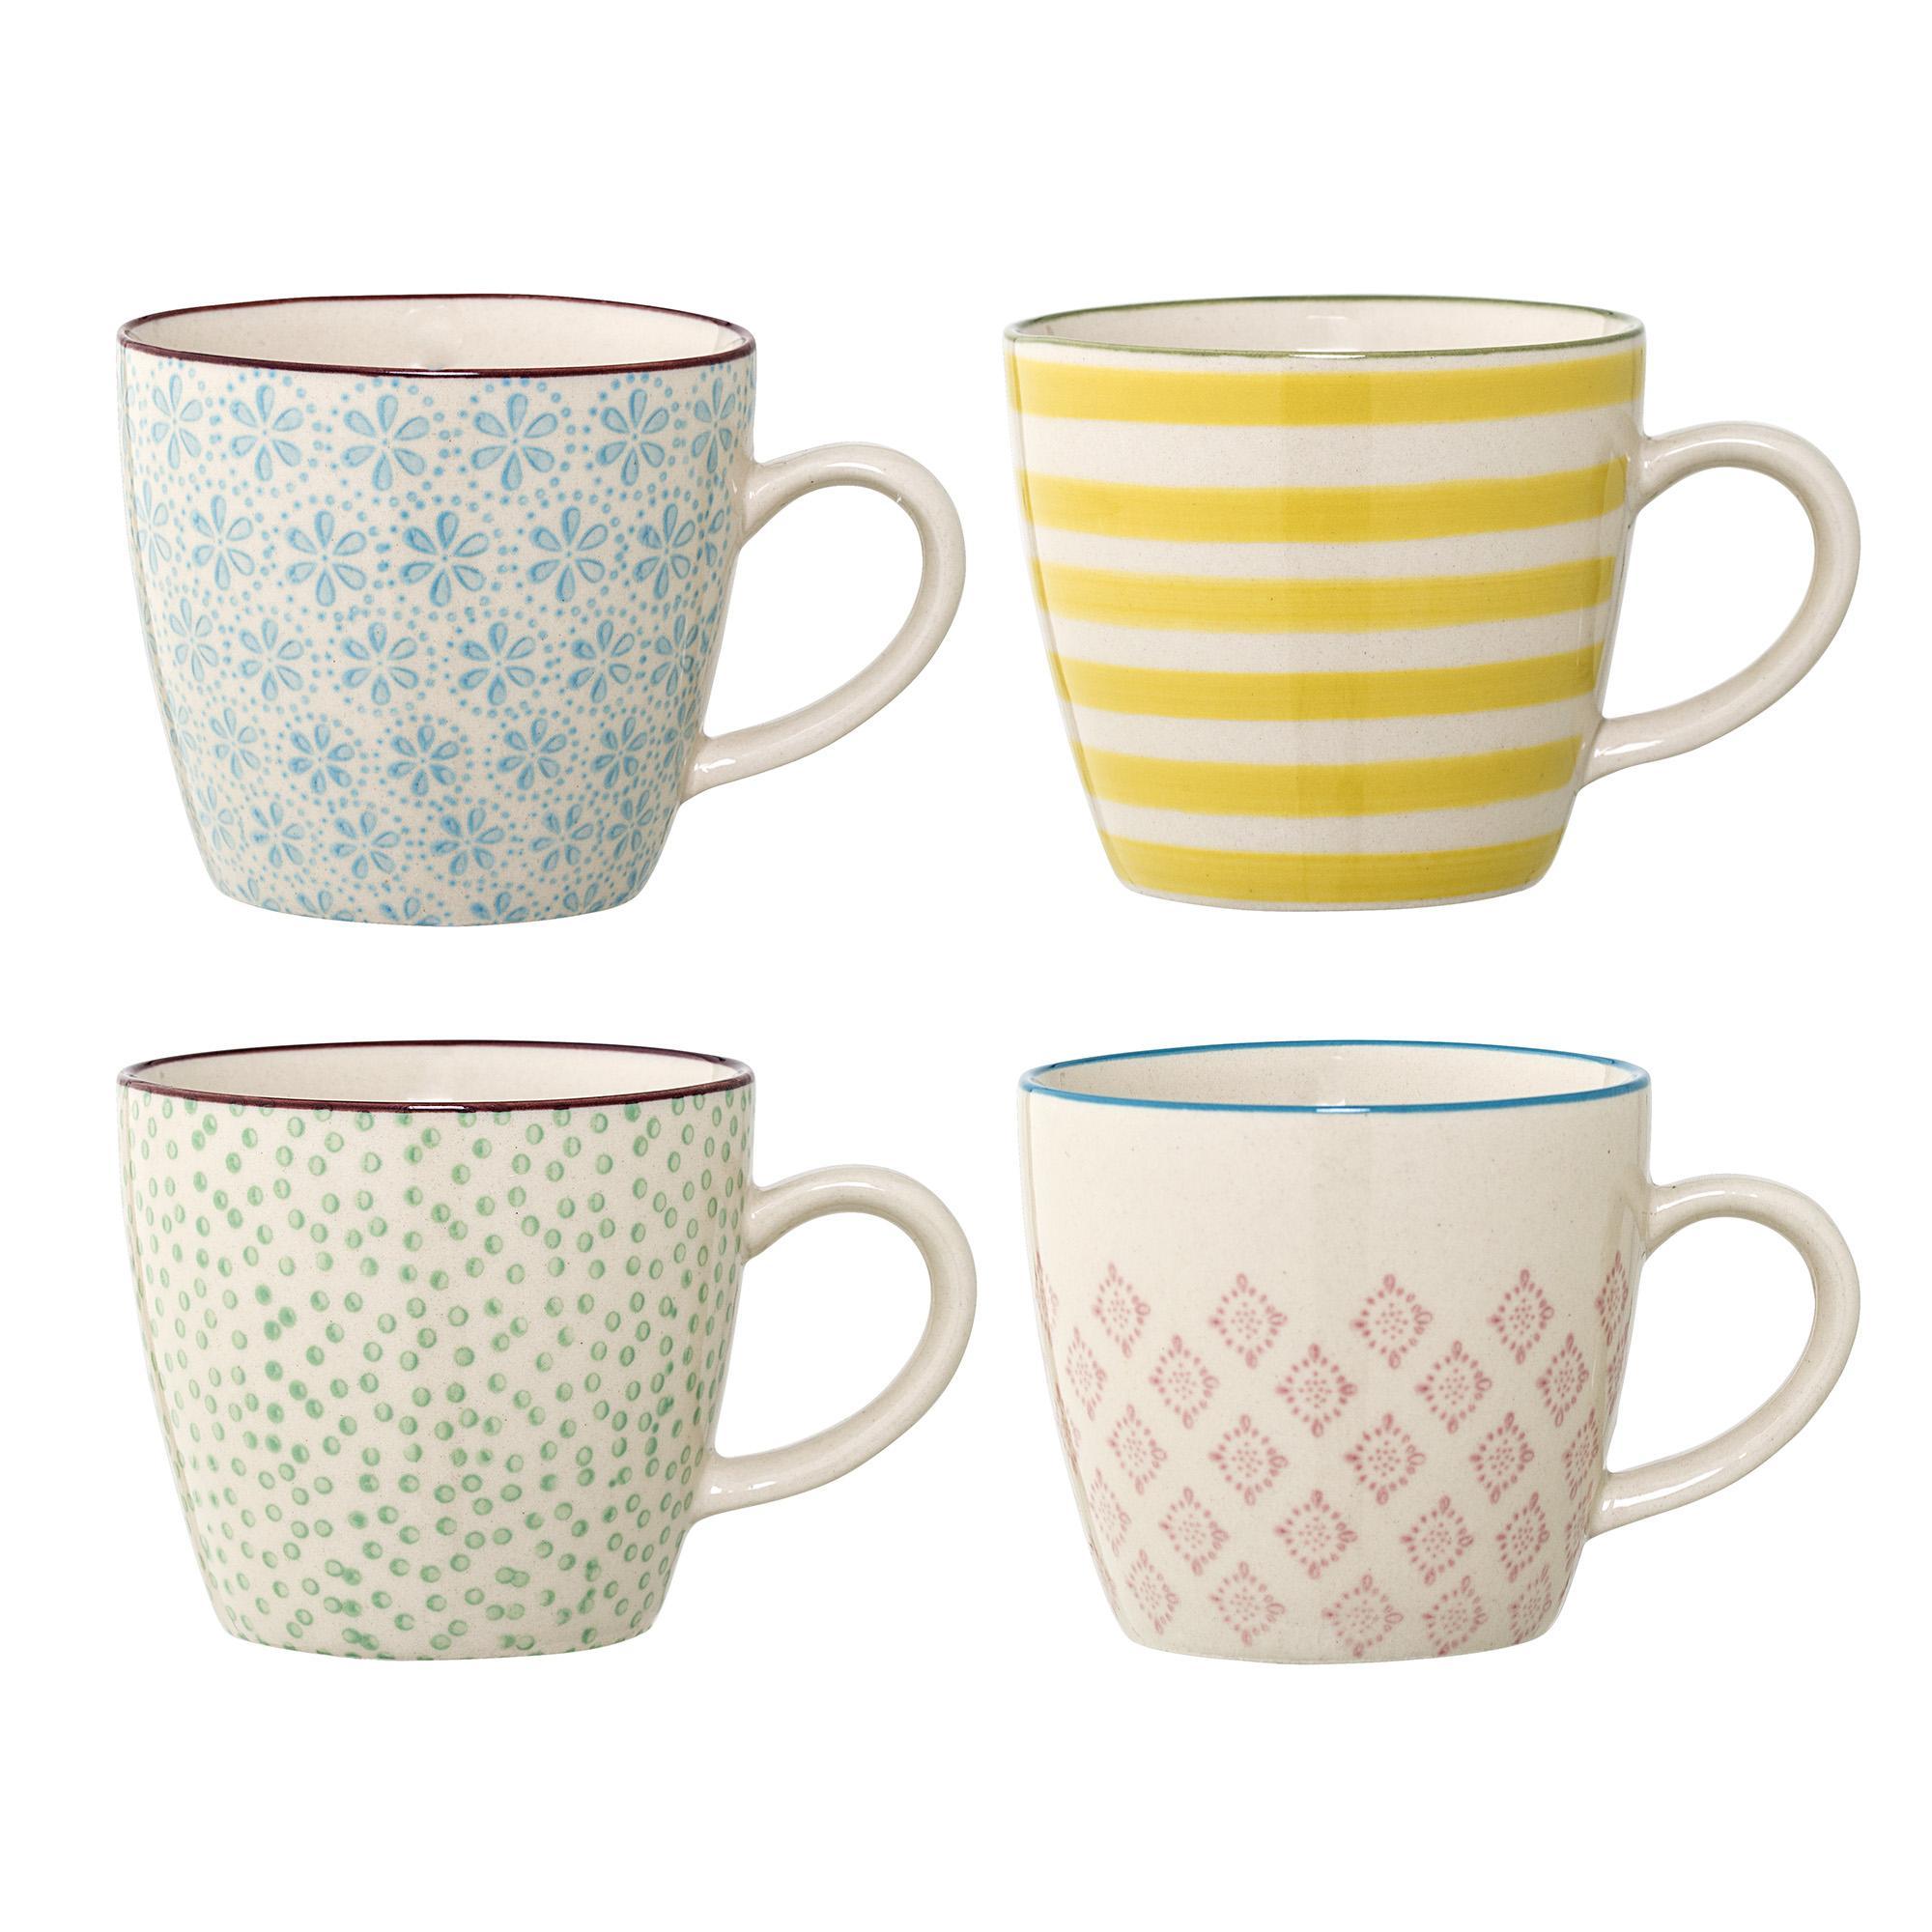 tasses bloomingville patrizia x4 pastel shop. Black Bedroom Furniture Sets. Home Design Ideas